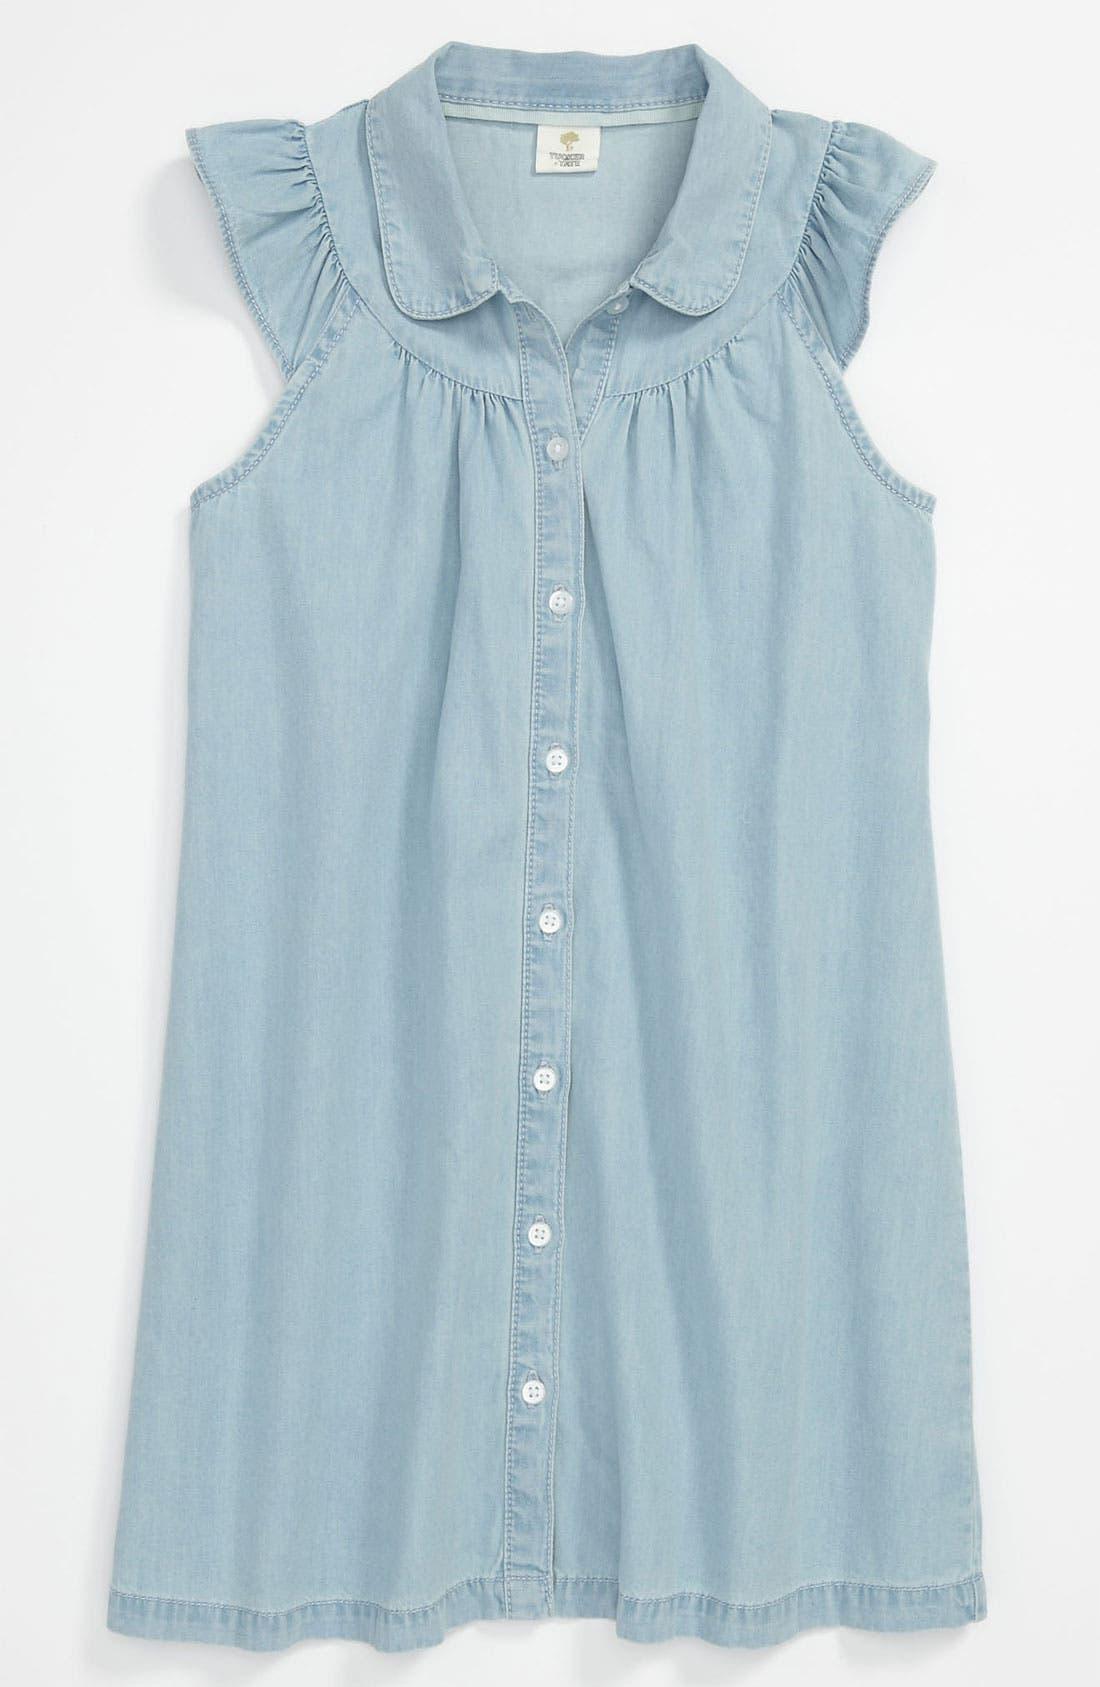 Main Image - Tucker + Tate 'Kate' Woven Dress (Little Girls & Big Girls)